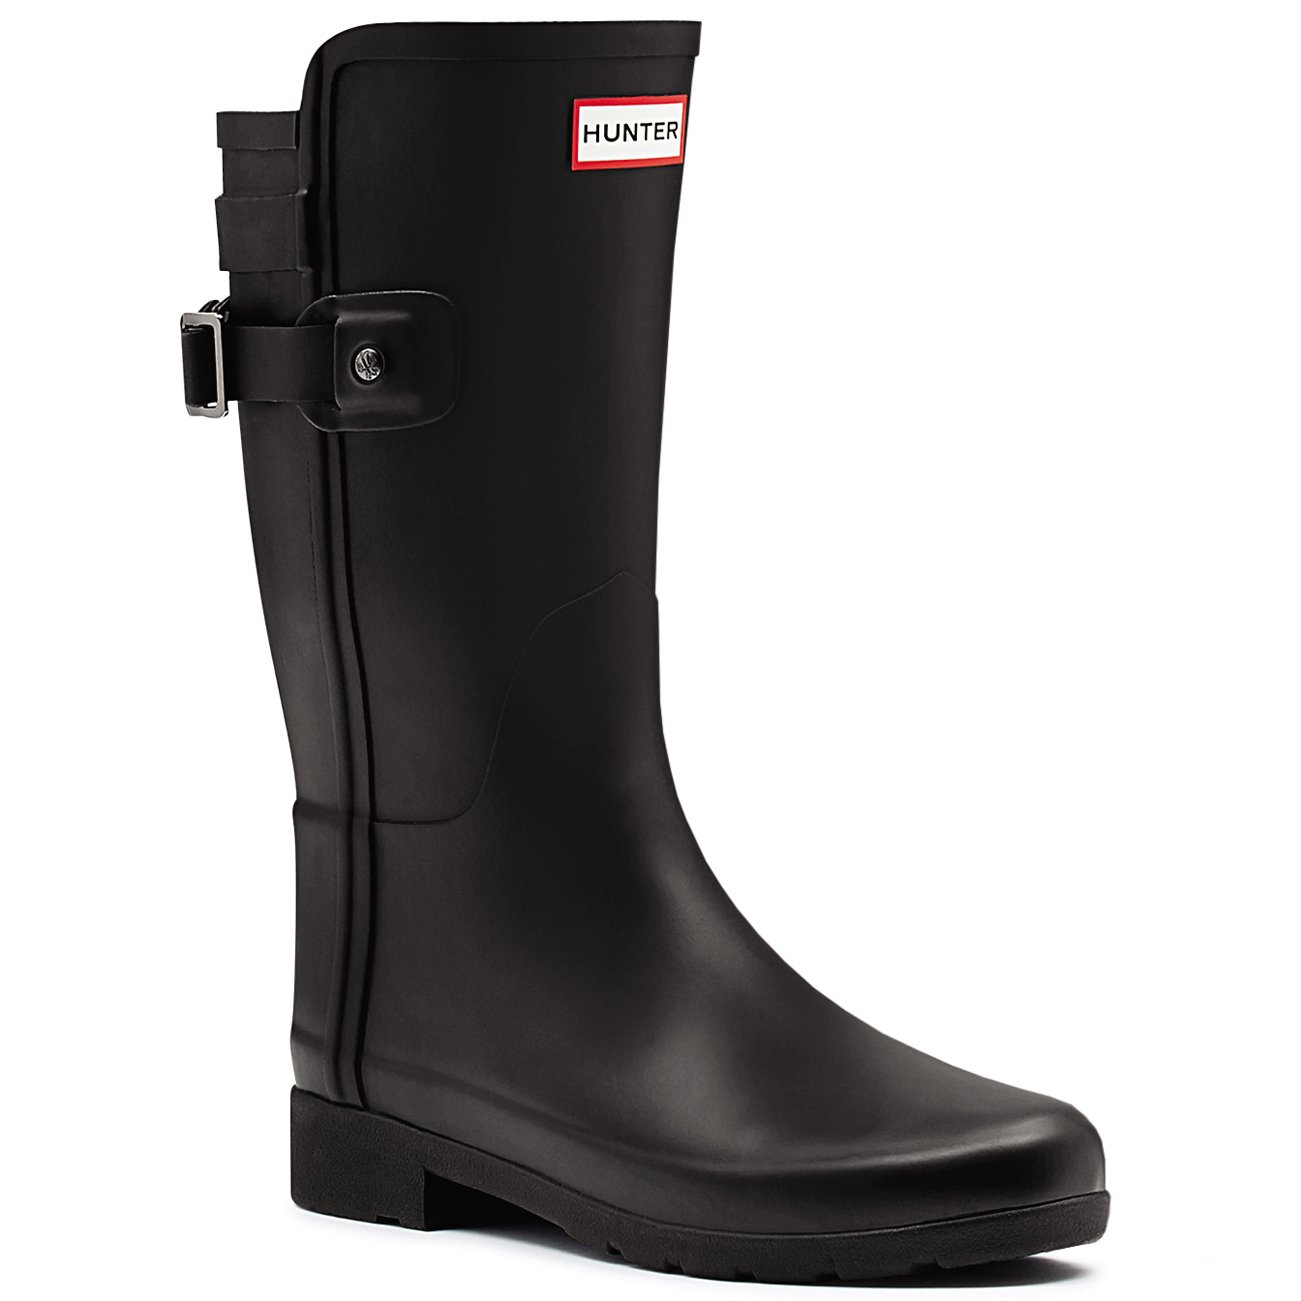 Hunter Womens Original Refined Back Strap Short Wellingtons Winter Boots - Black - 10-42